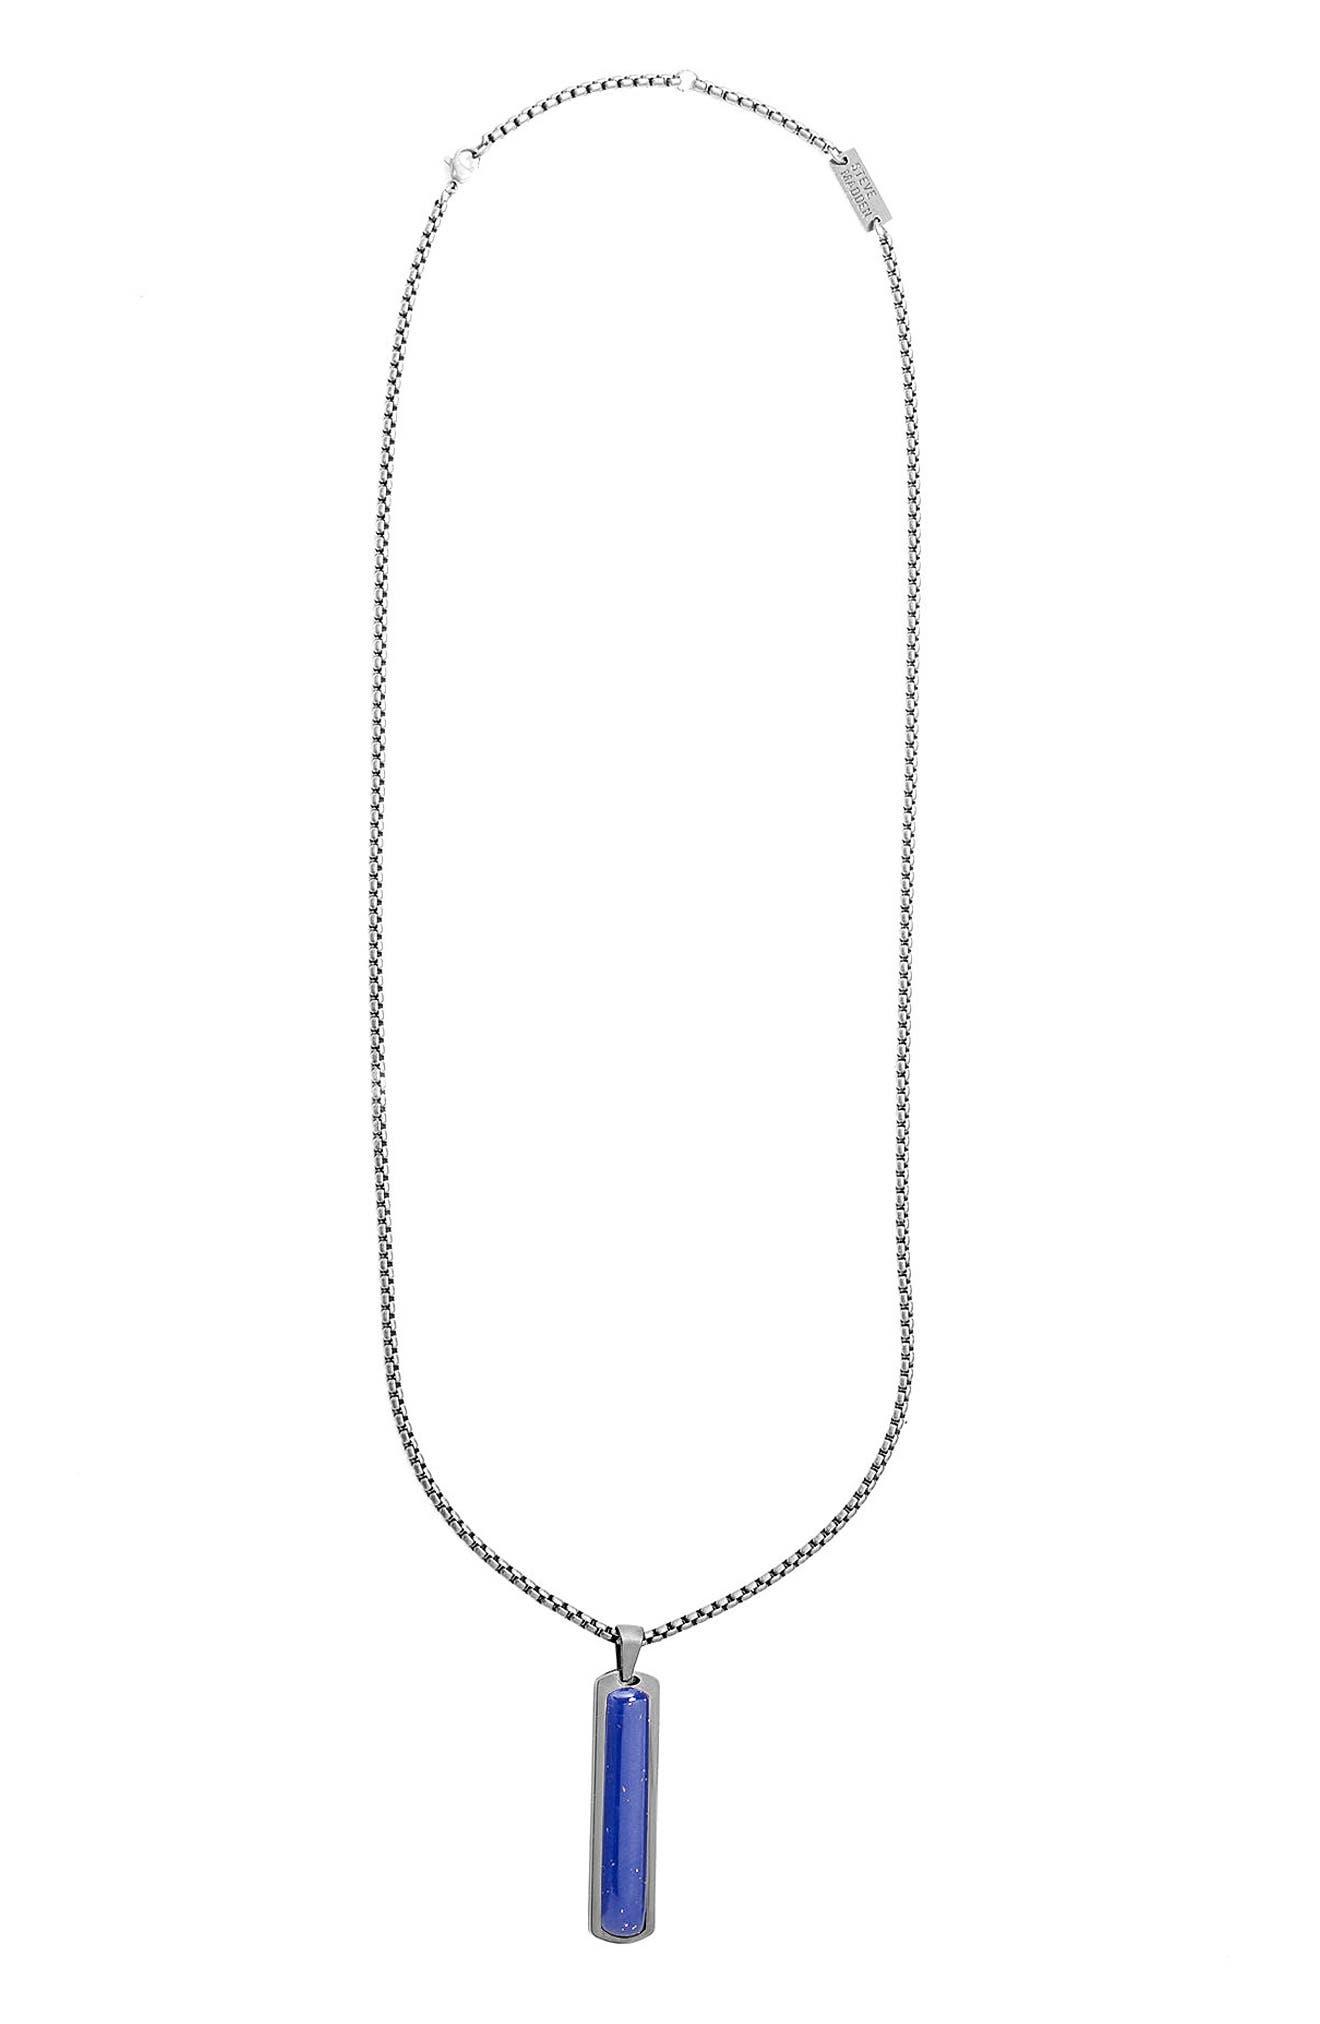 Steve Madden Oxidized Lapis Lazuli Pendant Necklace